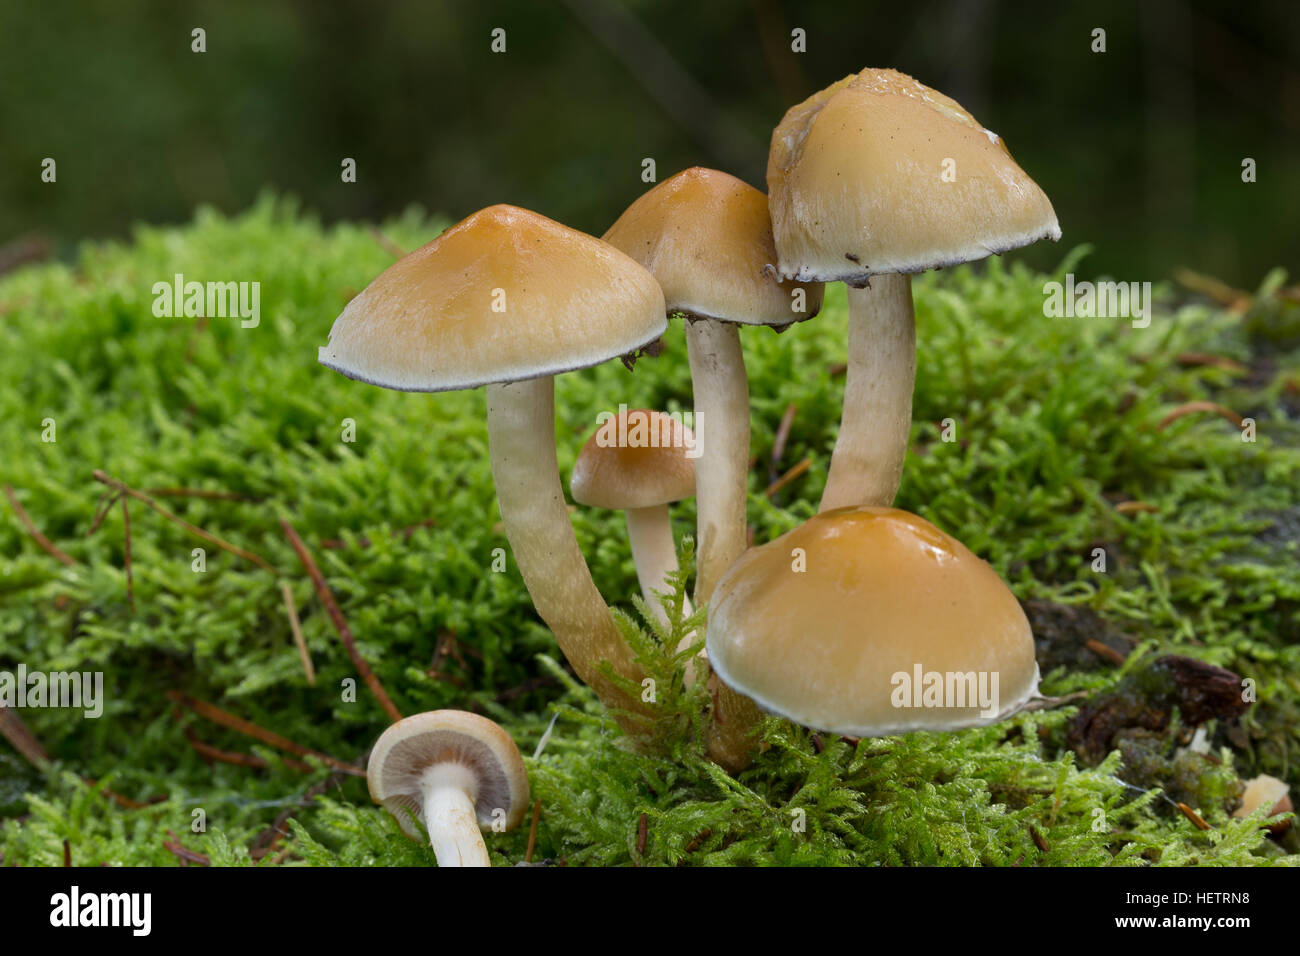 Rauchblättriger Schwefelkopf, Graublättriger Schwefelkopf, Milder Schwefelkopf, Hypholoma capnoides, Conifer Tuft Stock Photo